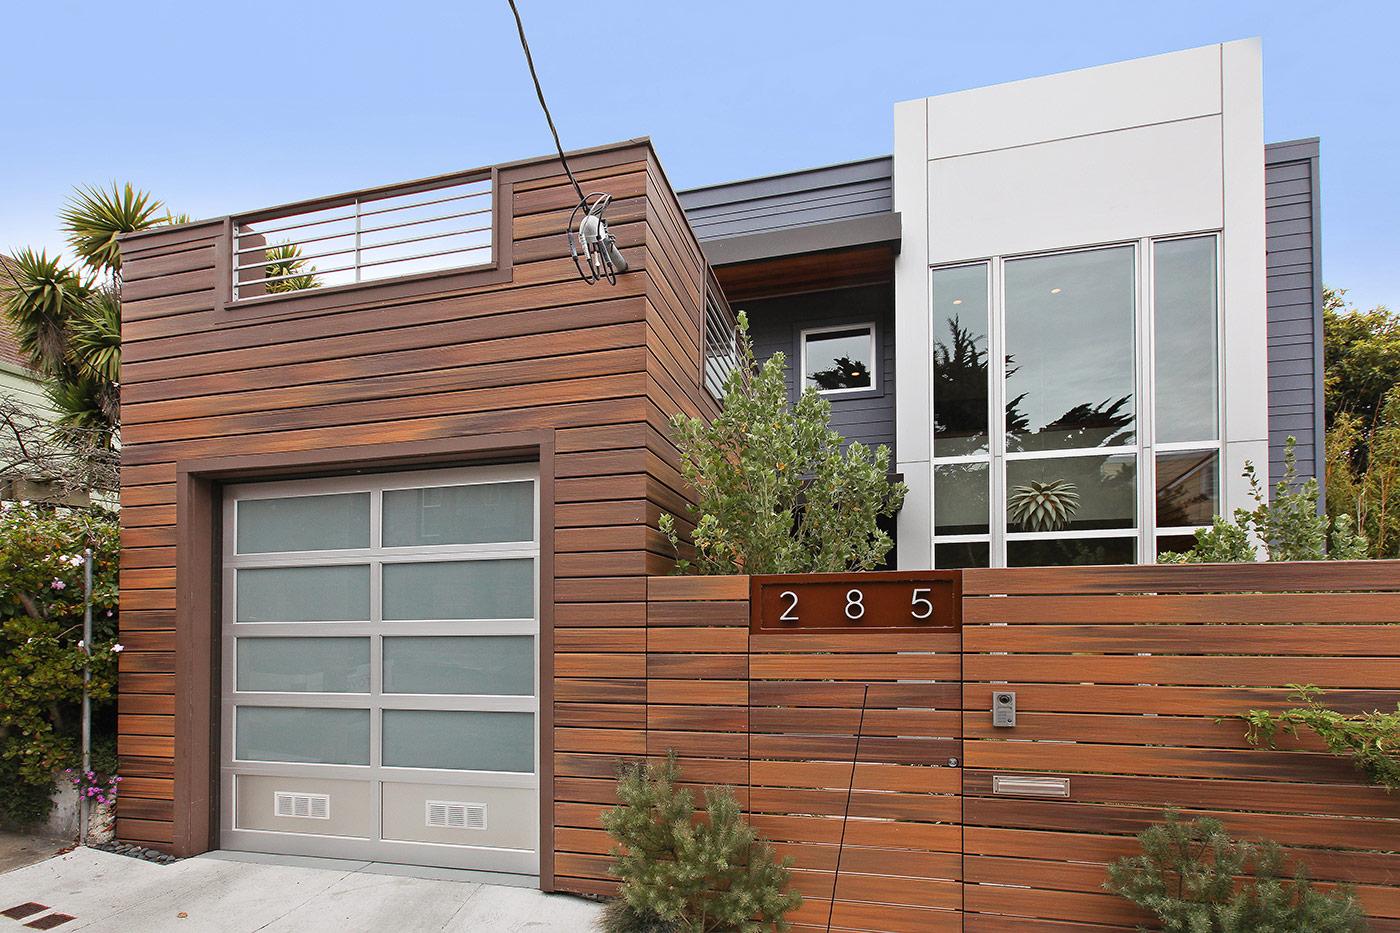 Modern Architecture u0026 Comfort in Bernal Heights